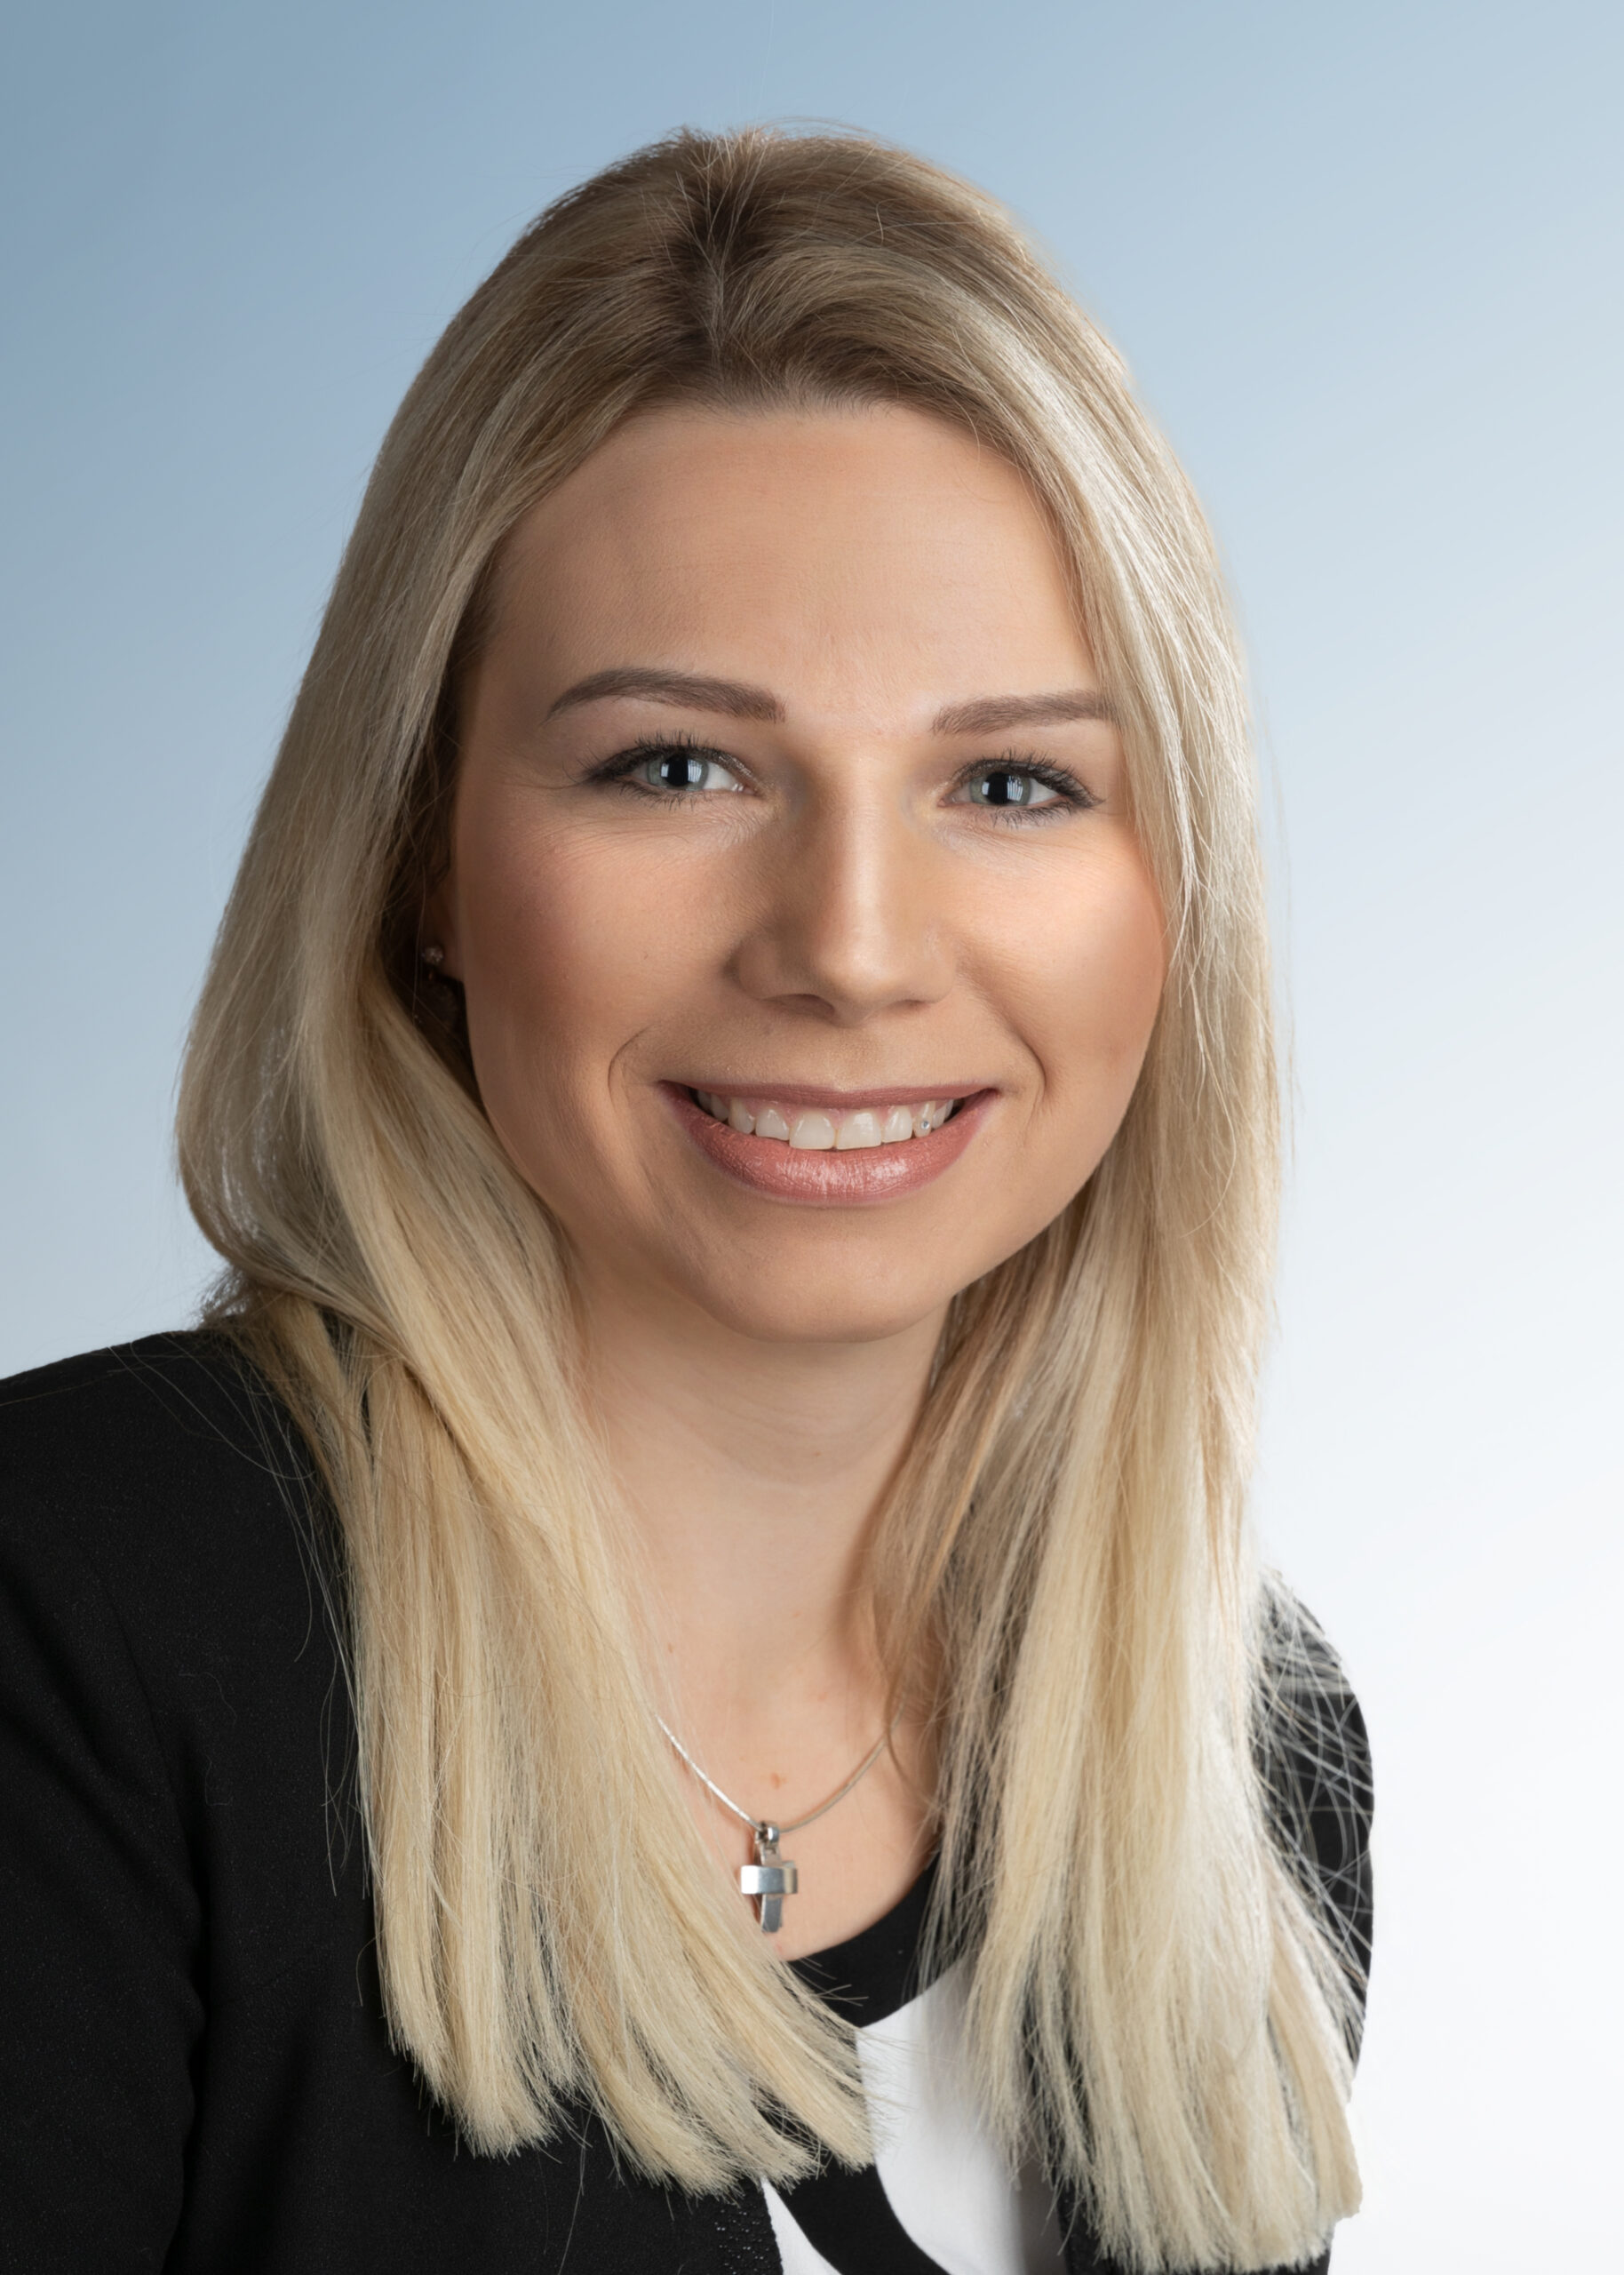 Eva-Sophia Rückel, Gemeinderätin Im Markt Geiselwind